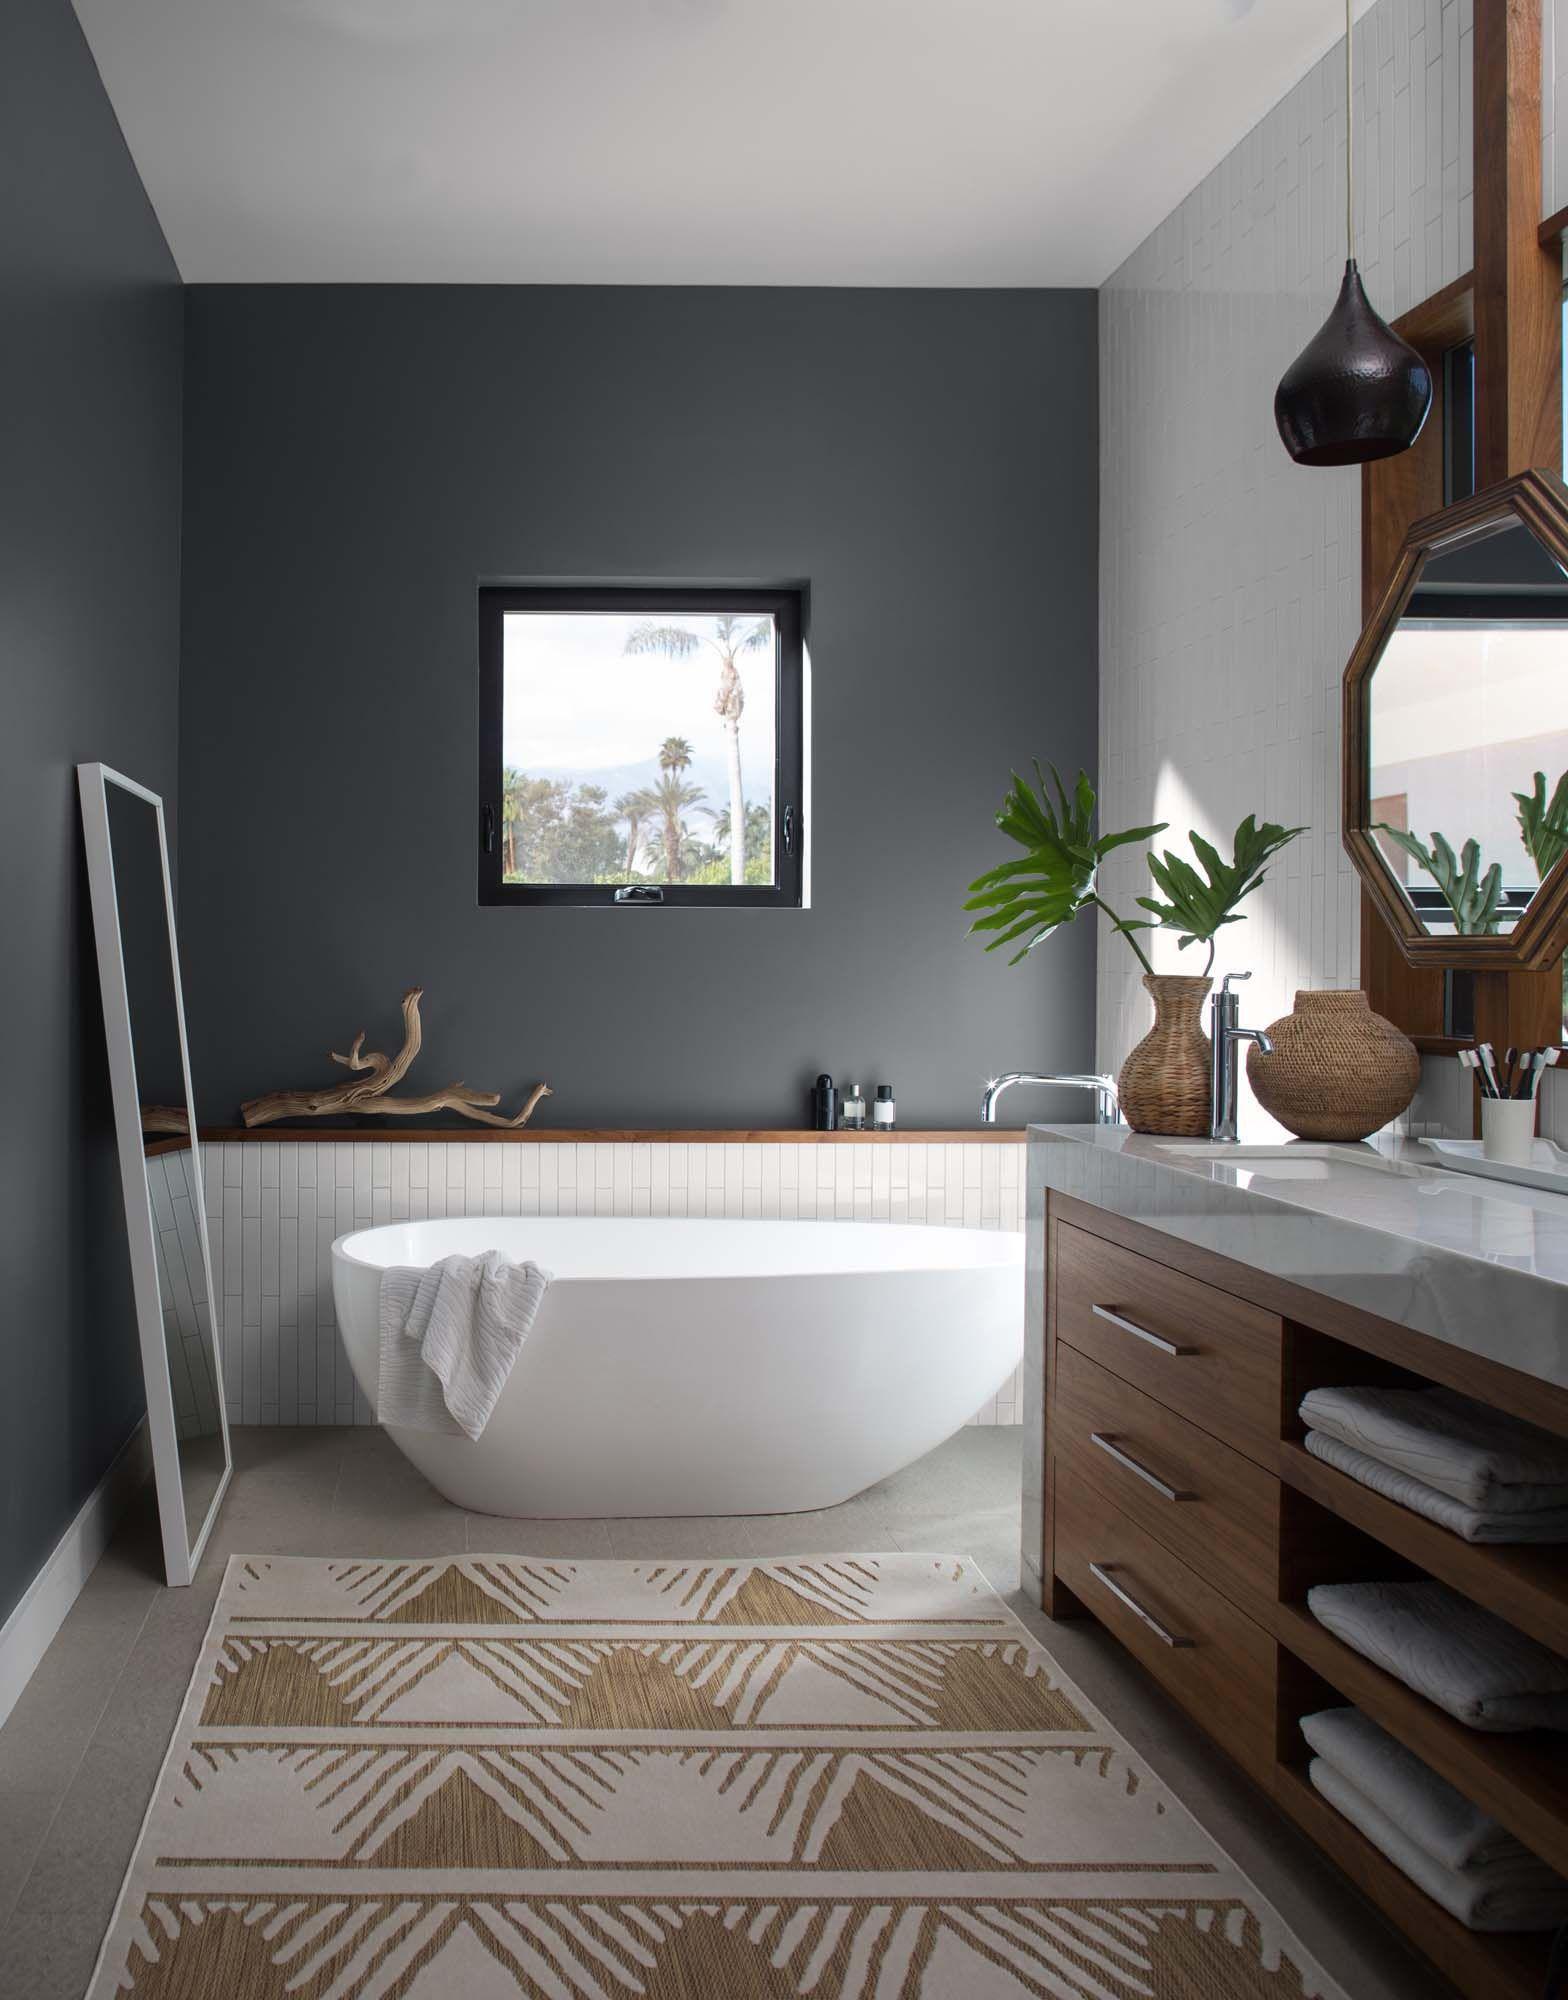 Designers Benjamin Moore Best Bathroom Paint Colors Bathroom Wall Colors Tranquil Bathroom Bedroom and bathroom colors